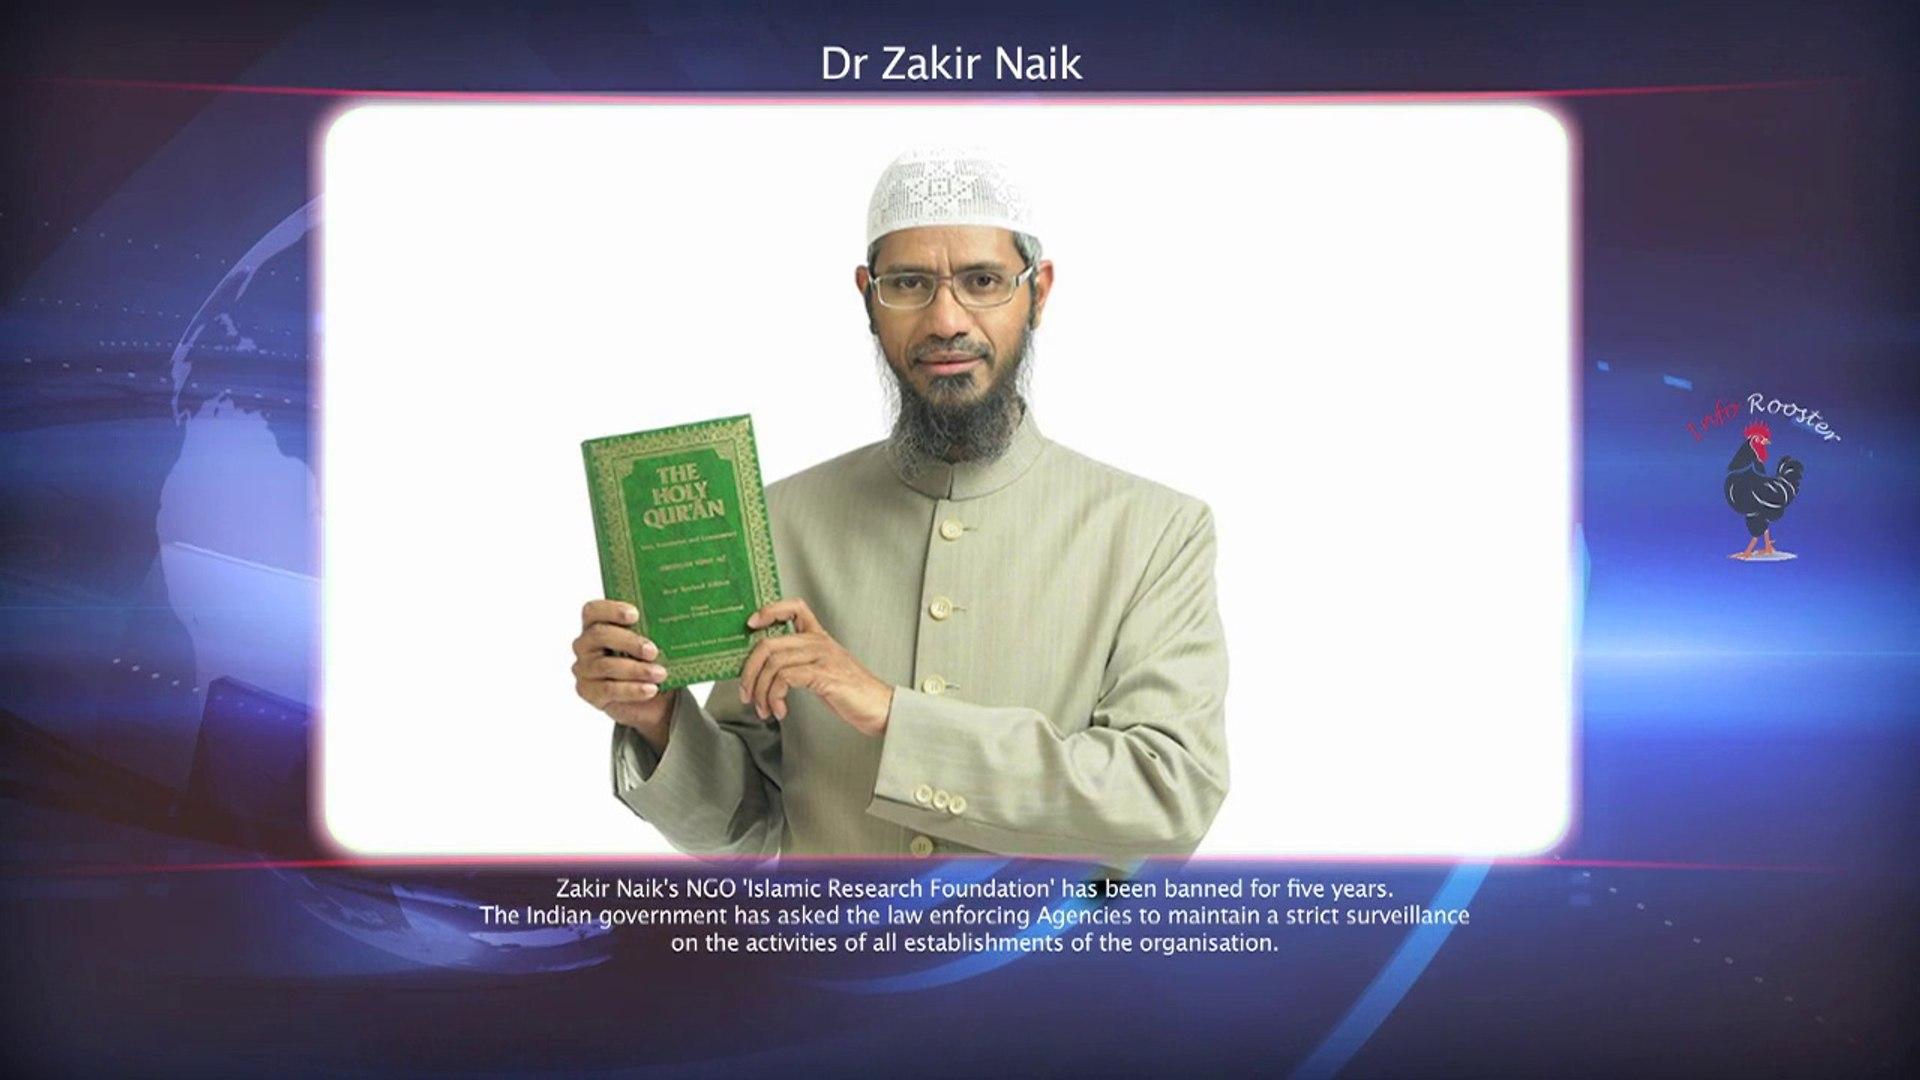 Dr. Zakir Naik NGOs Banned